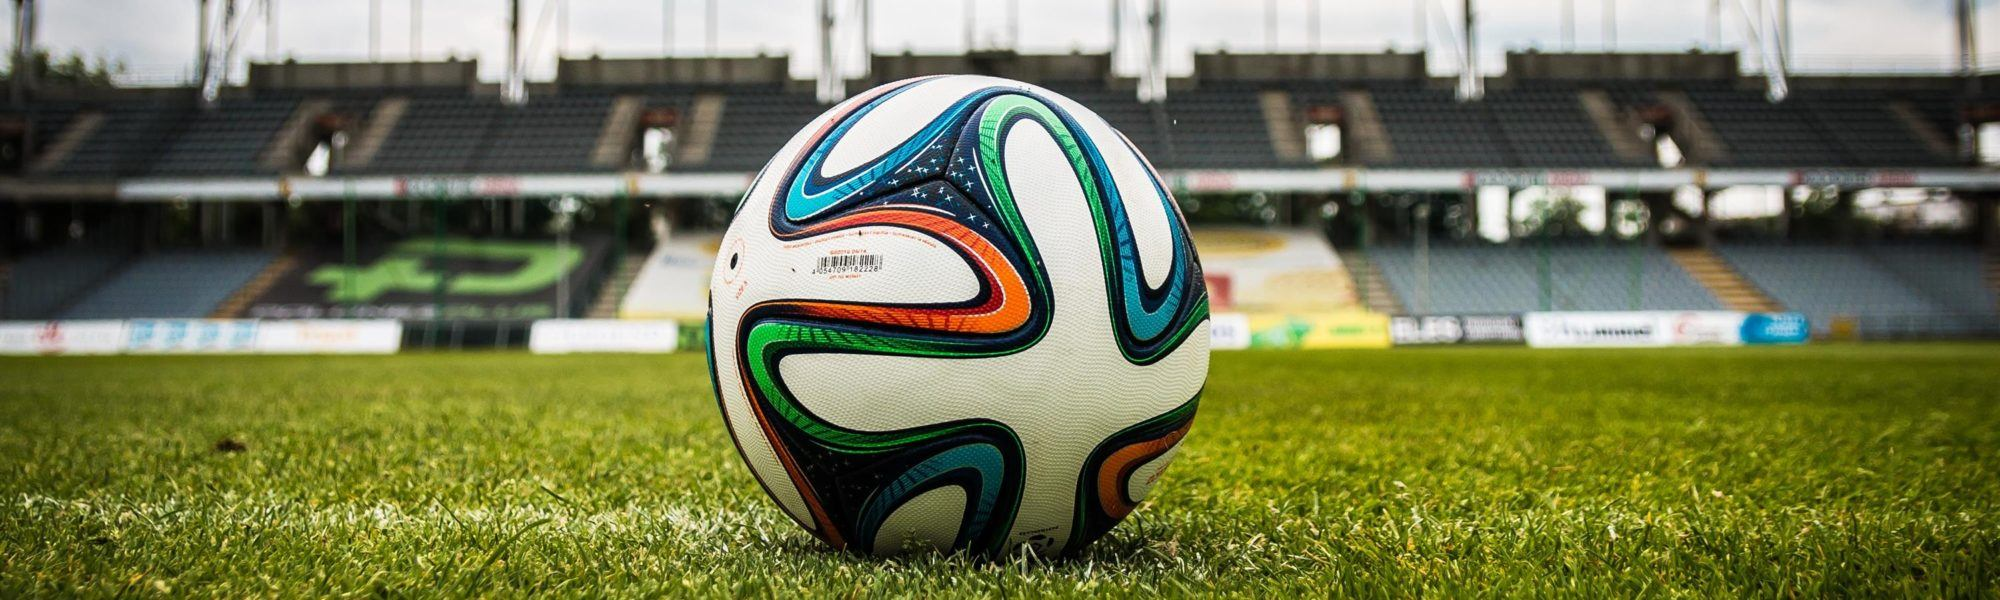 Soccer predictions - Soccer-Predictions org